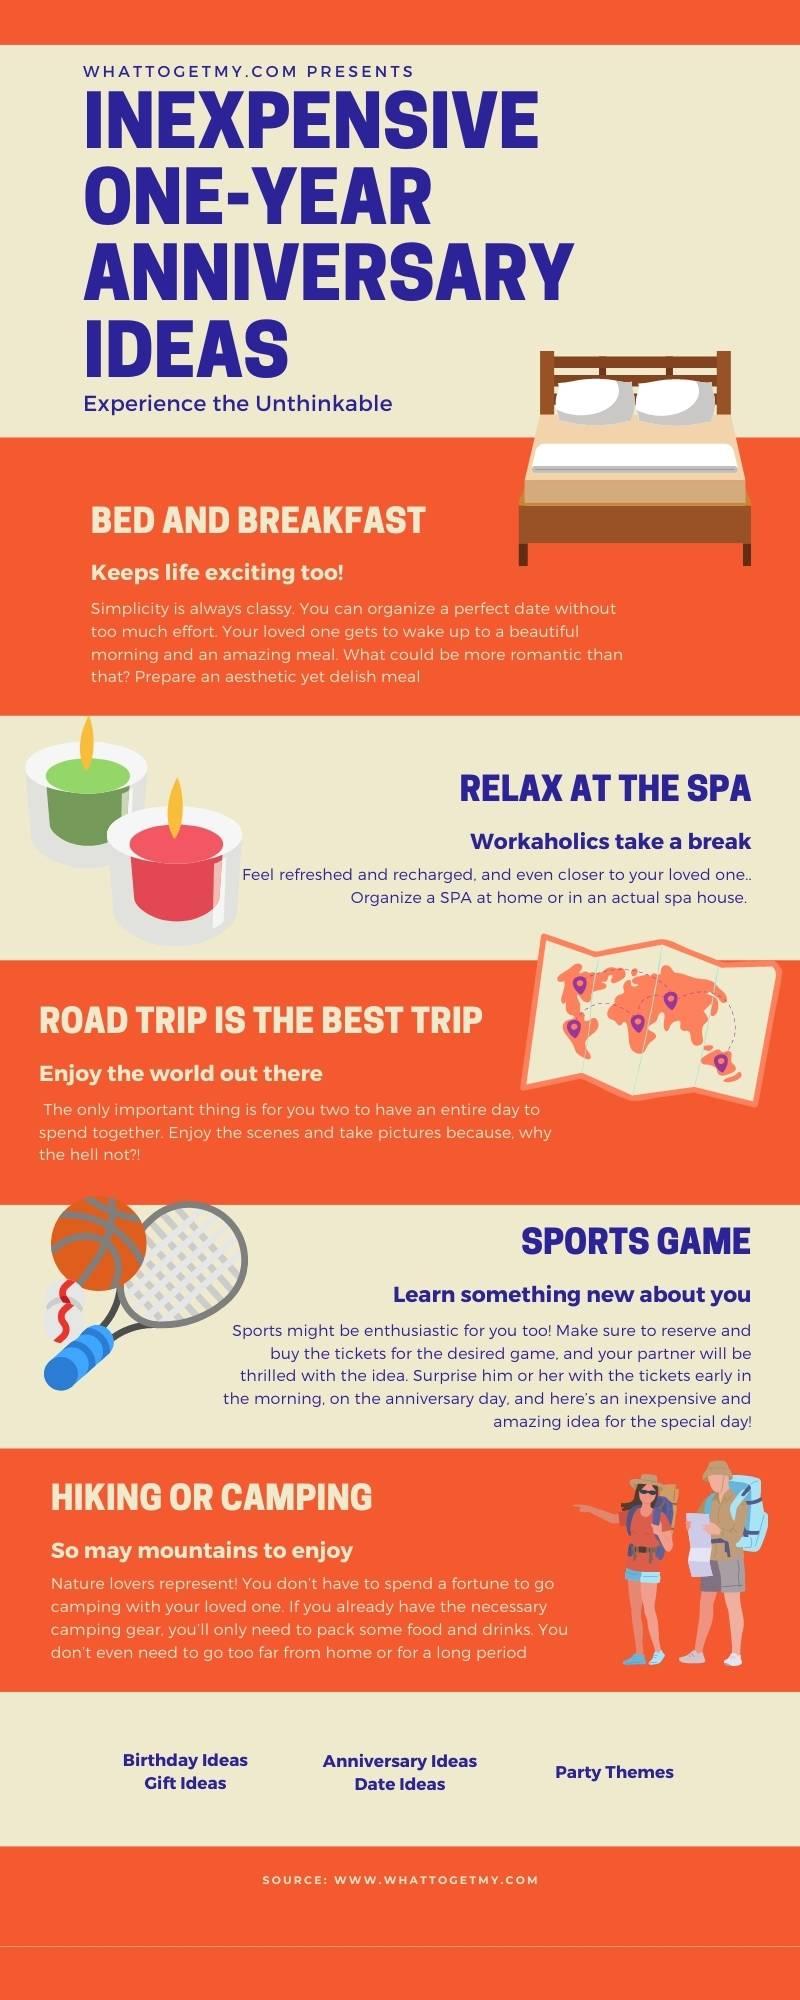 Infographic Inexpensive One Year Anniversary Ideas